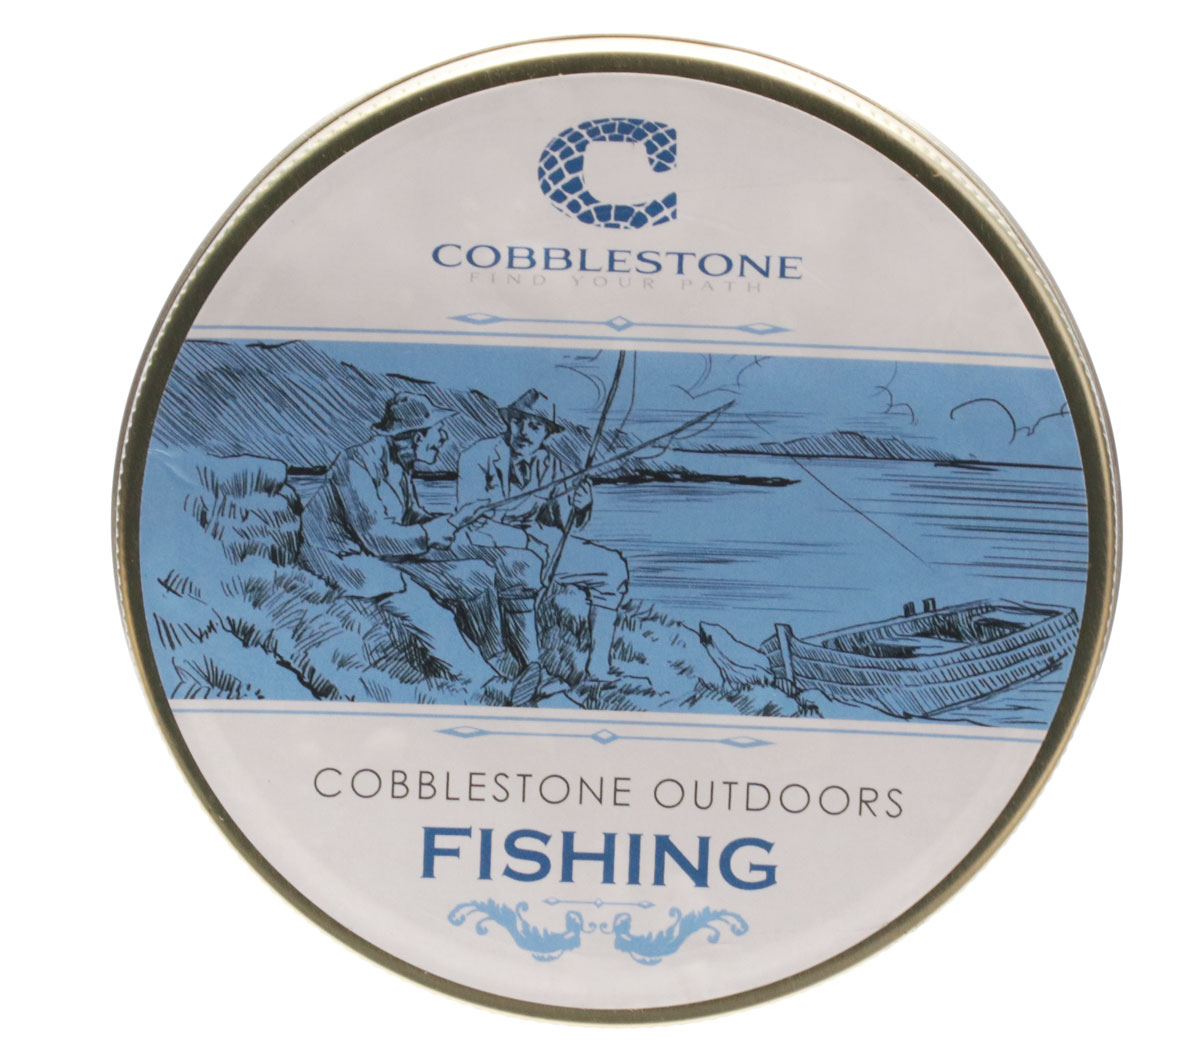 Cobblestone Outdoors Fishing 1.75oz